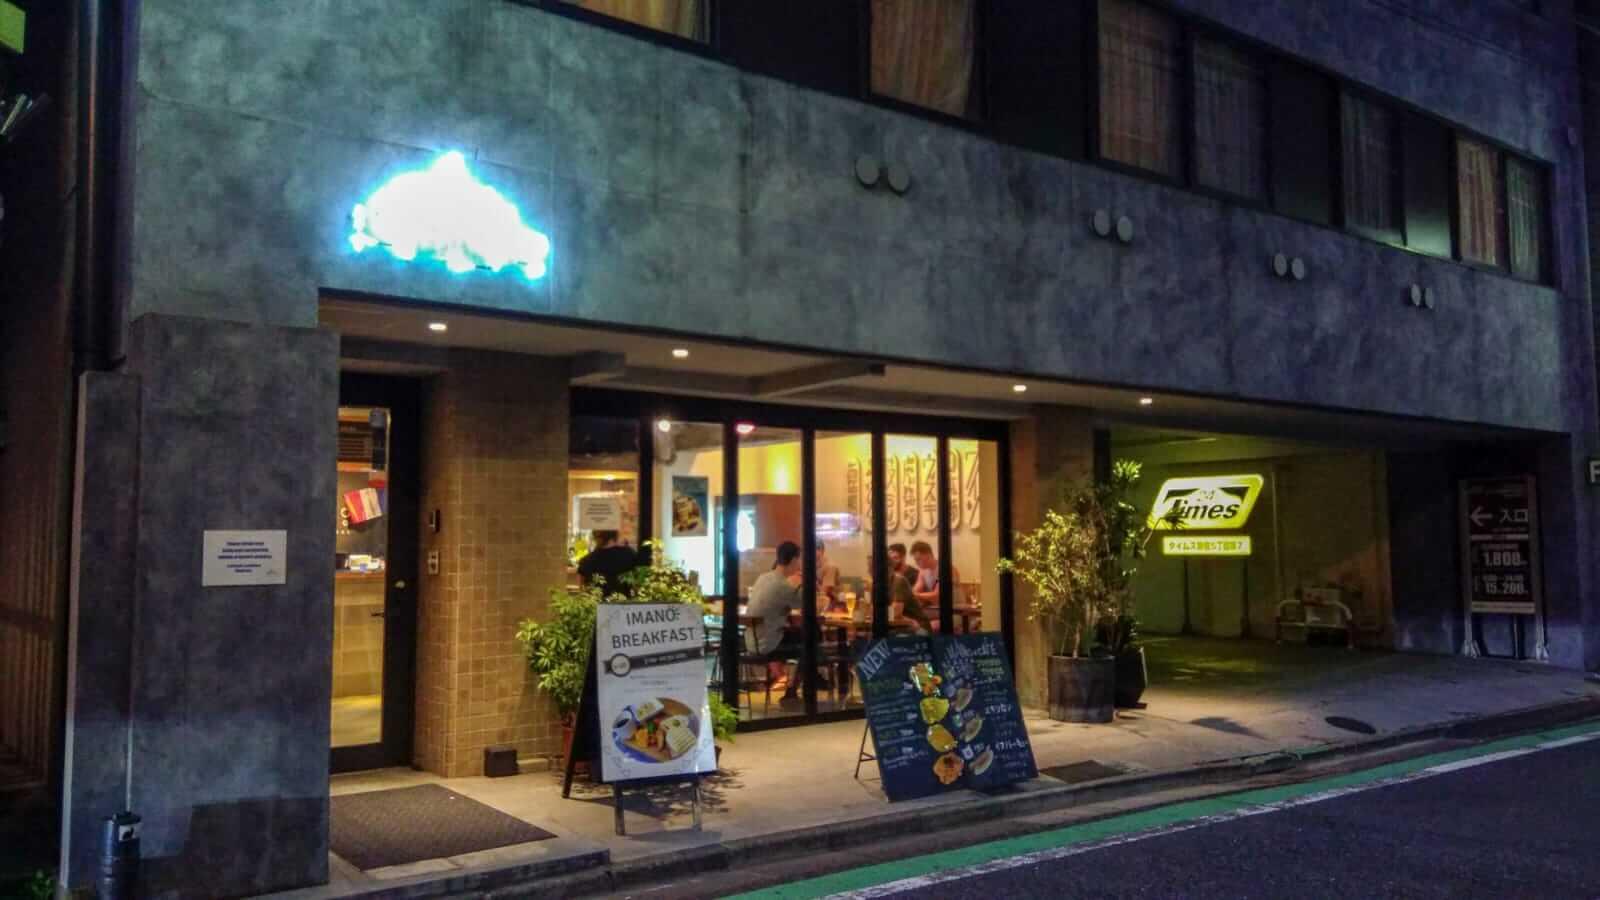 shop at Imano Tokyo Hostel.